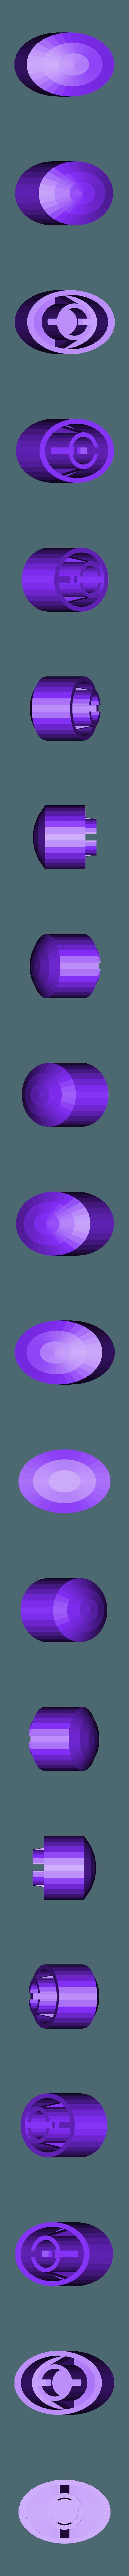 Grohe_Raindance_Button_Replacement_10.stl Download free STL file Grohe Raindance shower Button Replacement • 3D printer design, vsky279